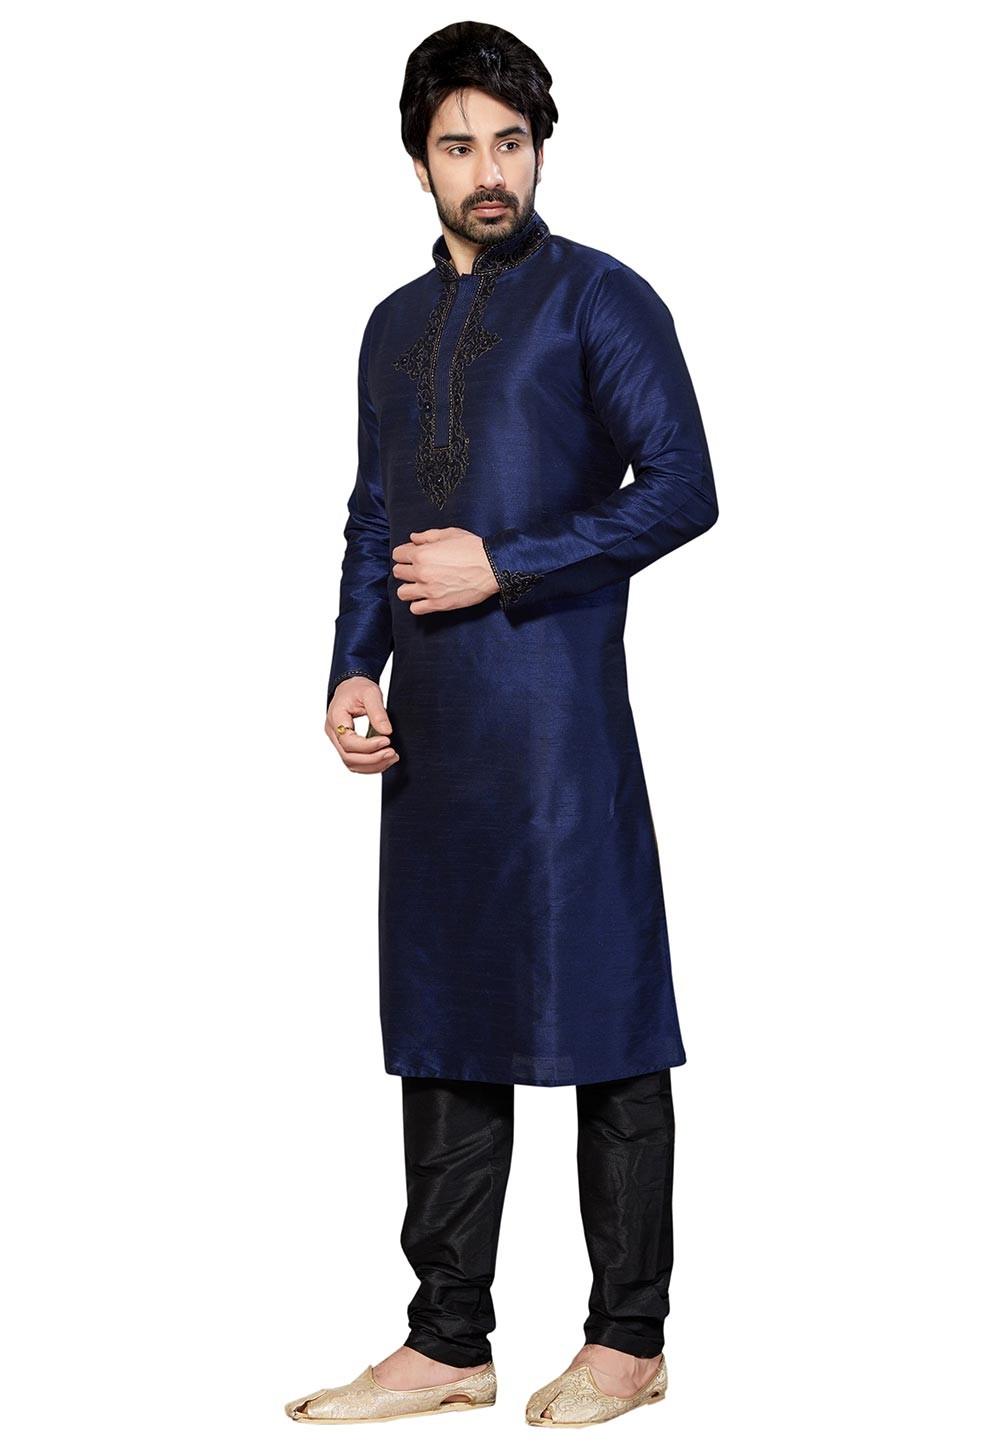 Blue Color Dupion Silk Party Wear Kurta Pajama With Thread Work.